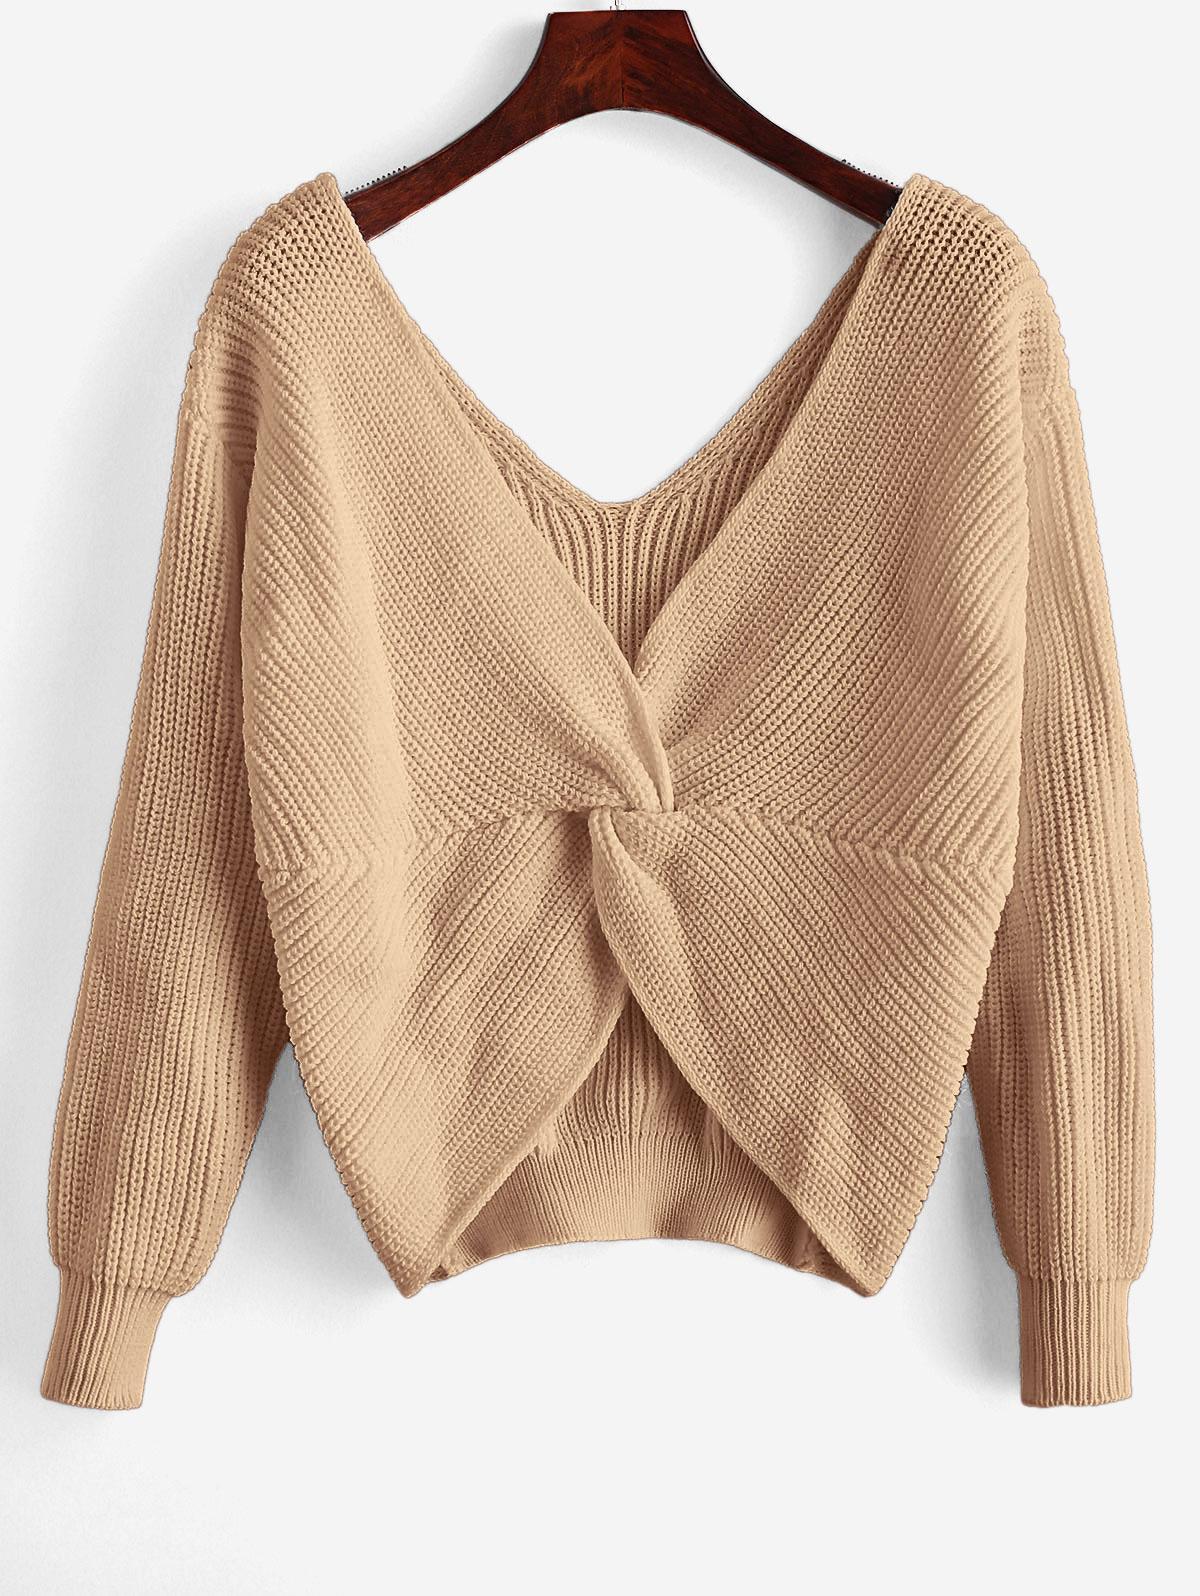 ZAFUL x Yasmine Bateman Twisted Plunging Drop Shoulder Jumper Sweater